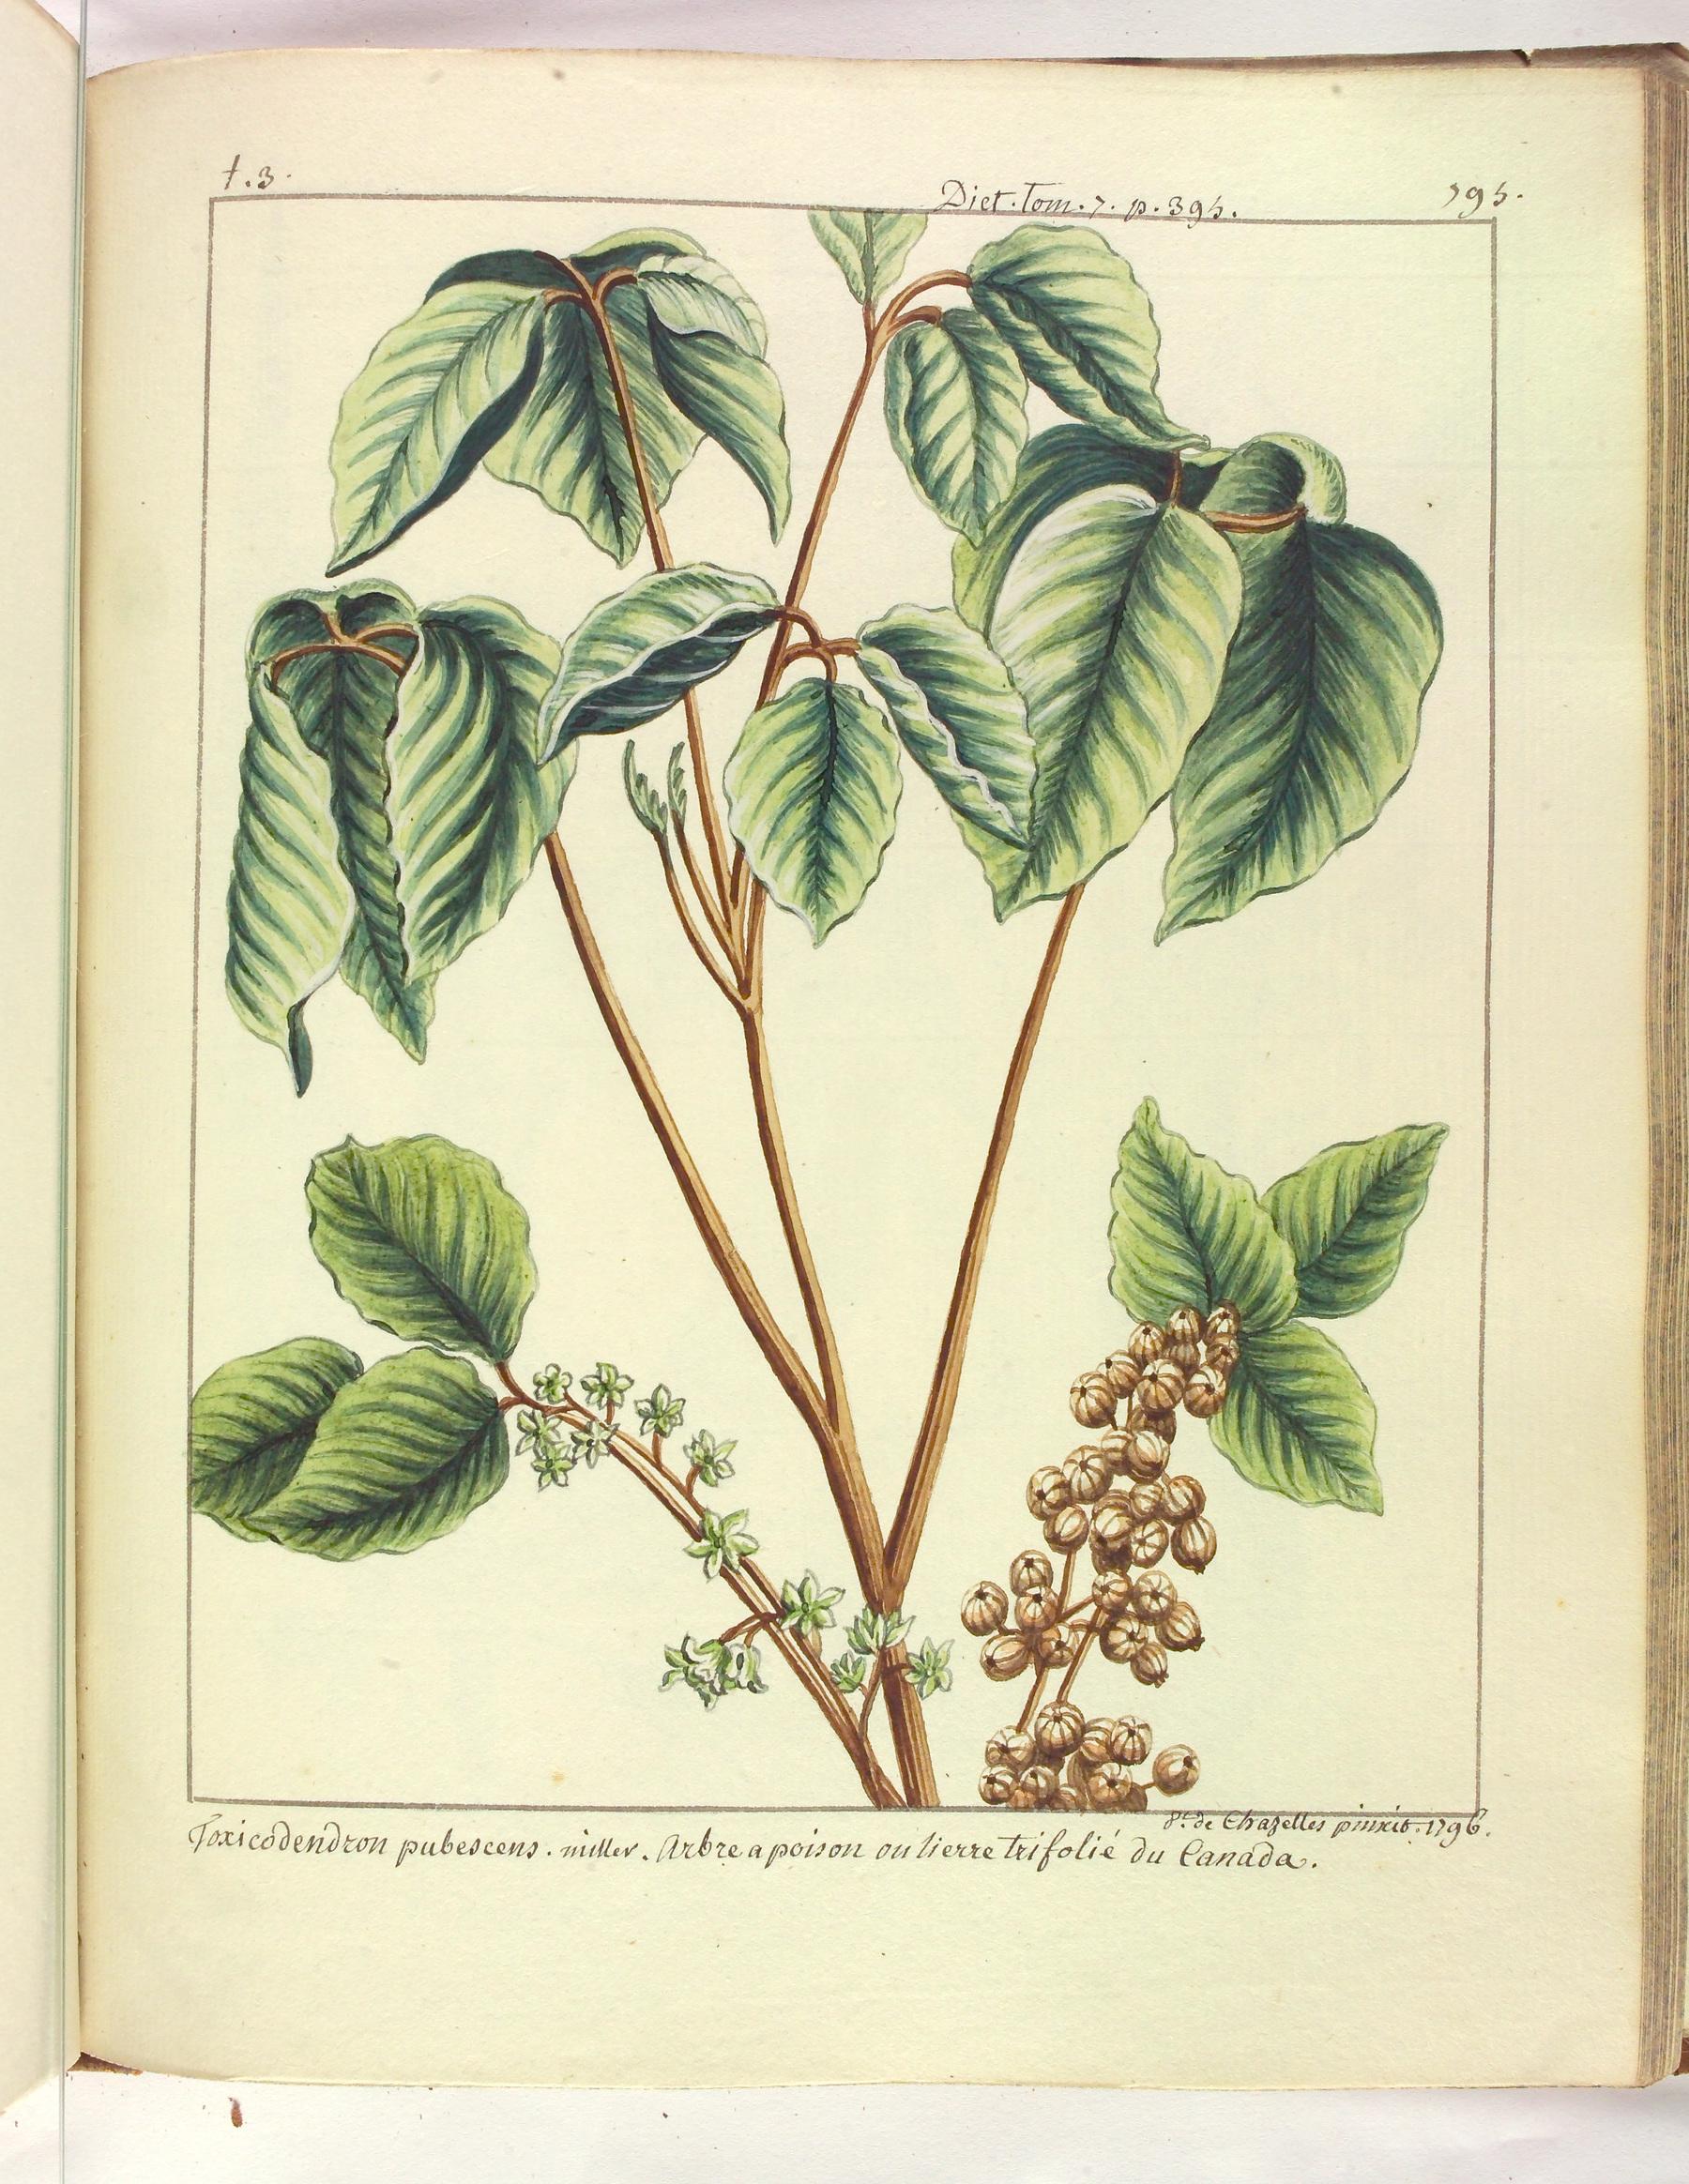 Contenu du Toxicodendron pubescens